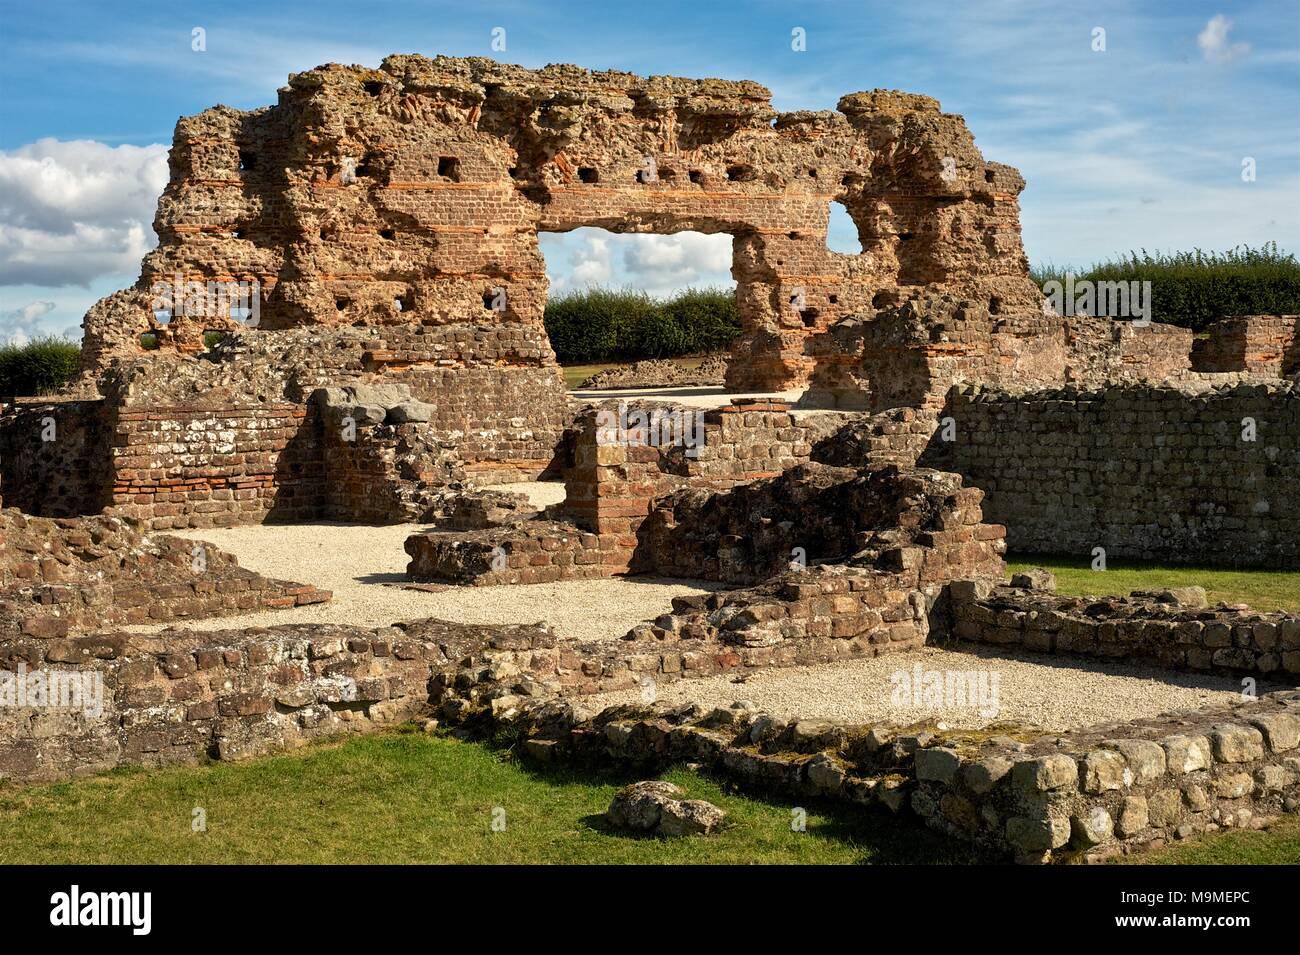 Roman ruins, standing brickwork at Wroxeter roman city, Shropshire England - Stock Image